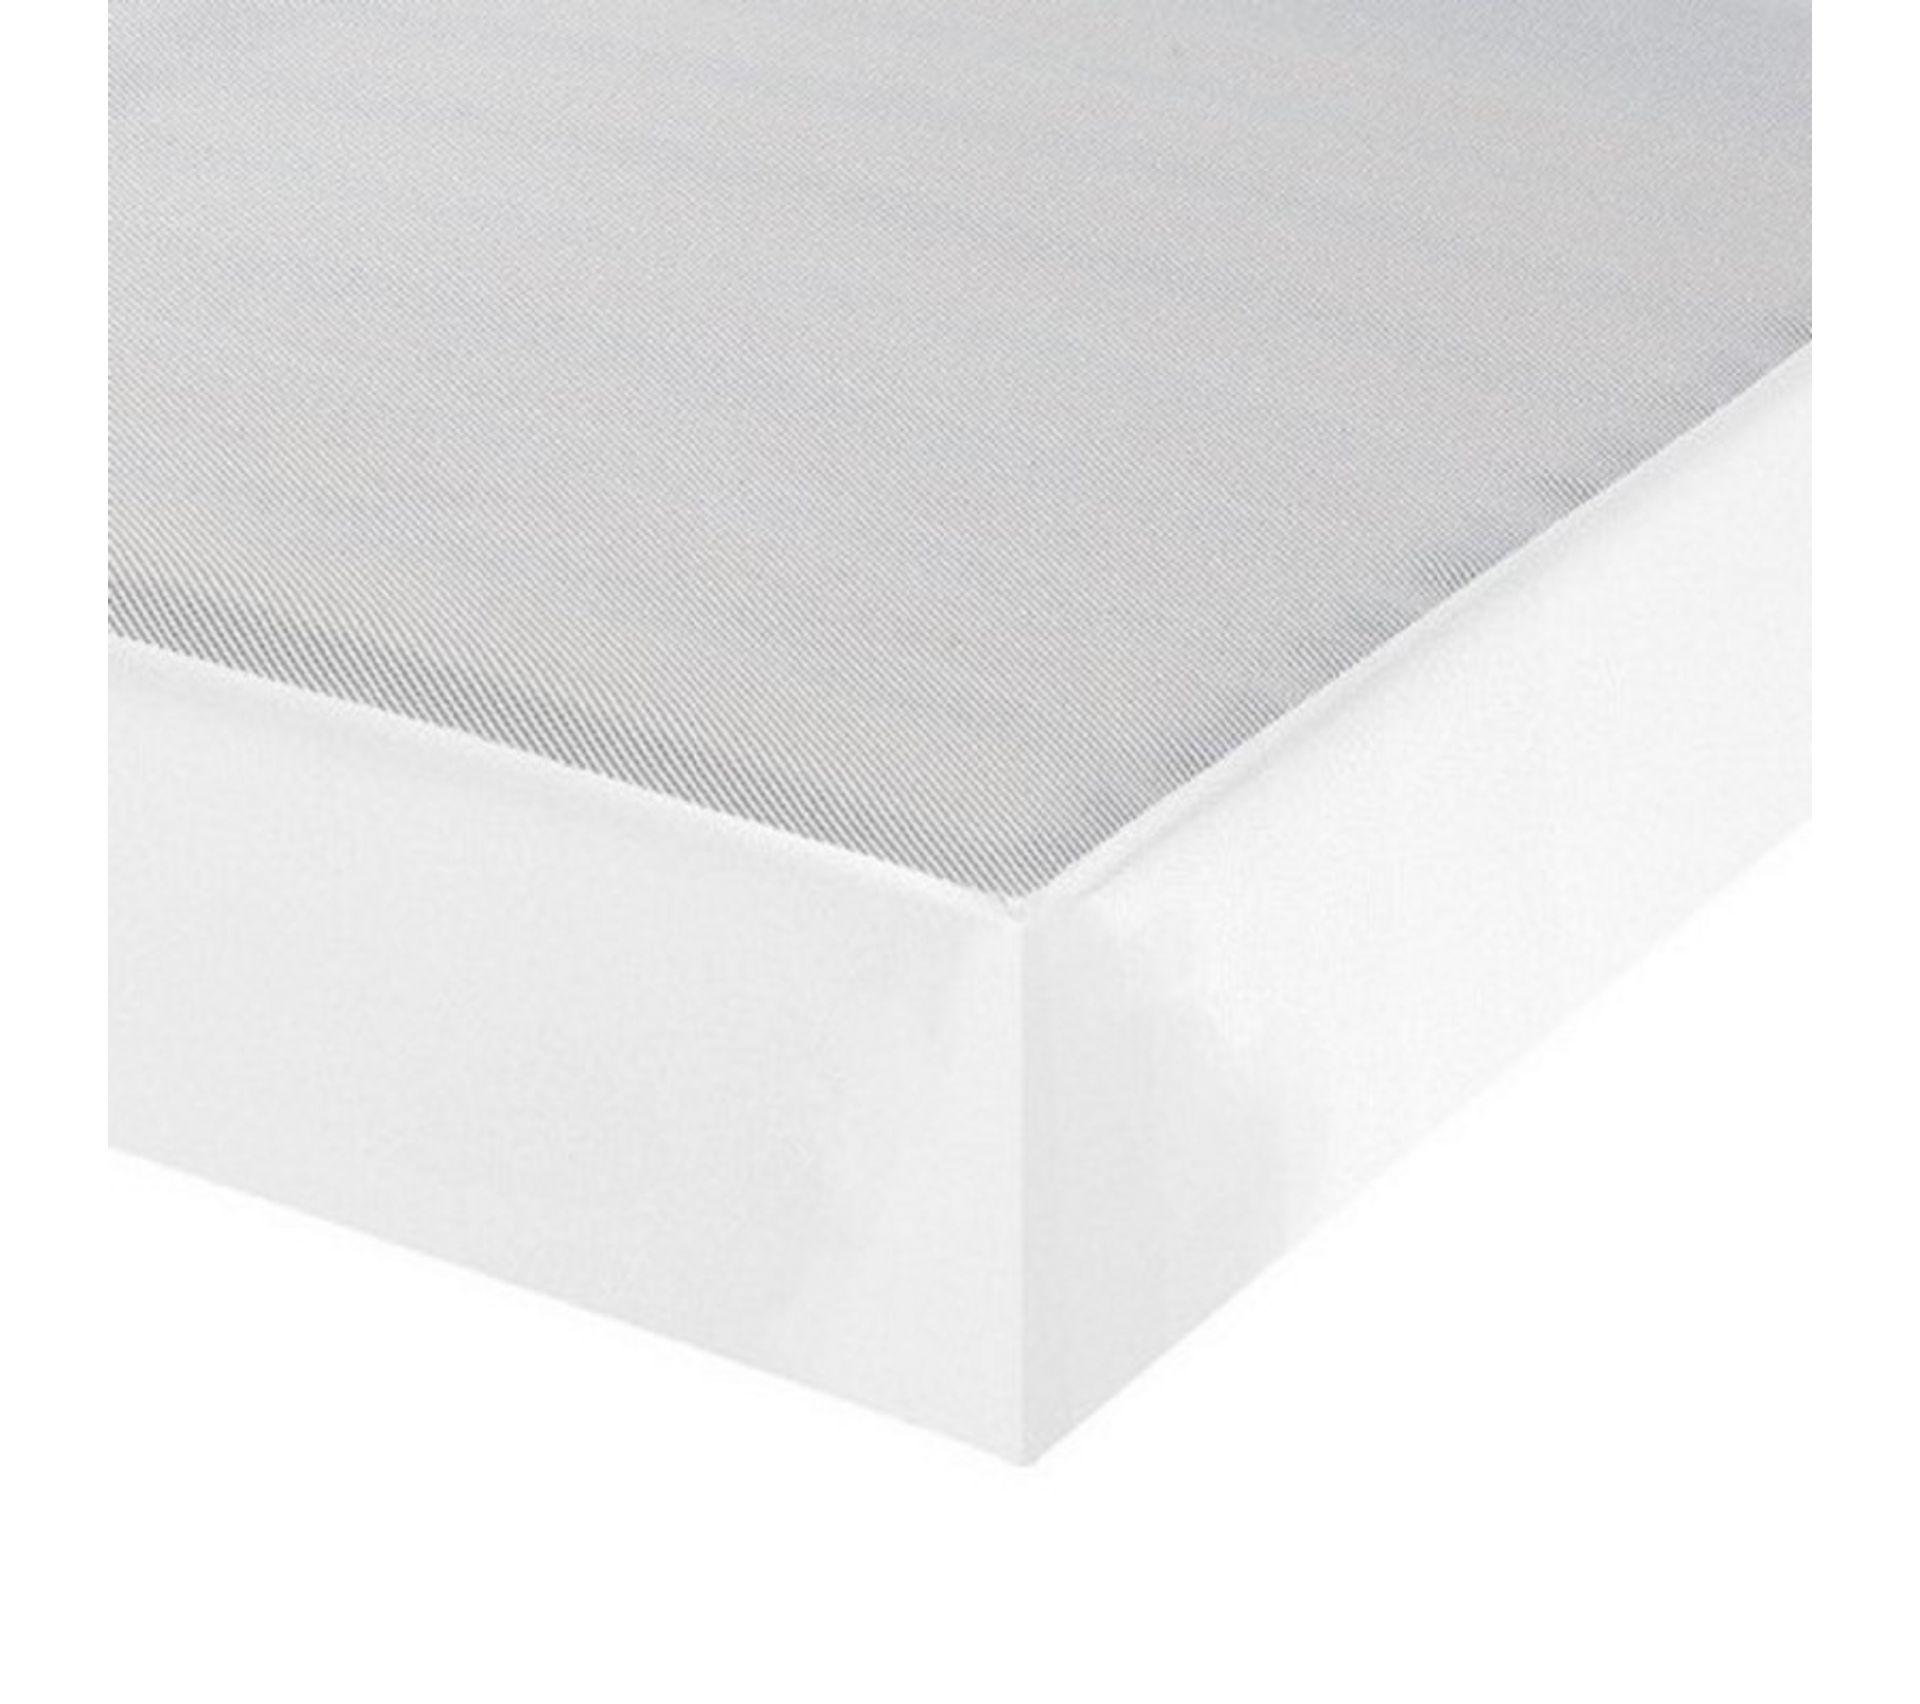 Sommier Tapissier 120x190 Omega Simili Blanc 2x18 Lattes Sommier Deco But